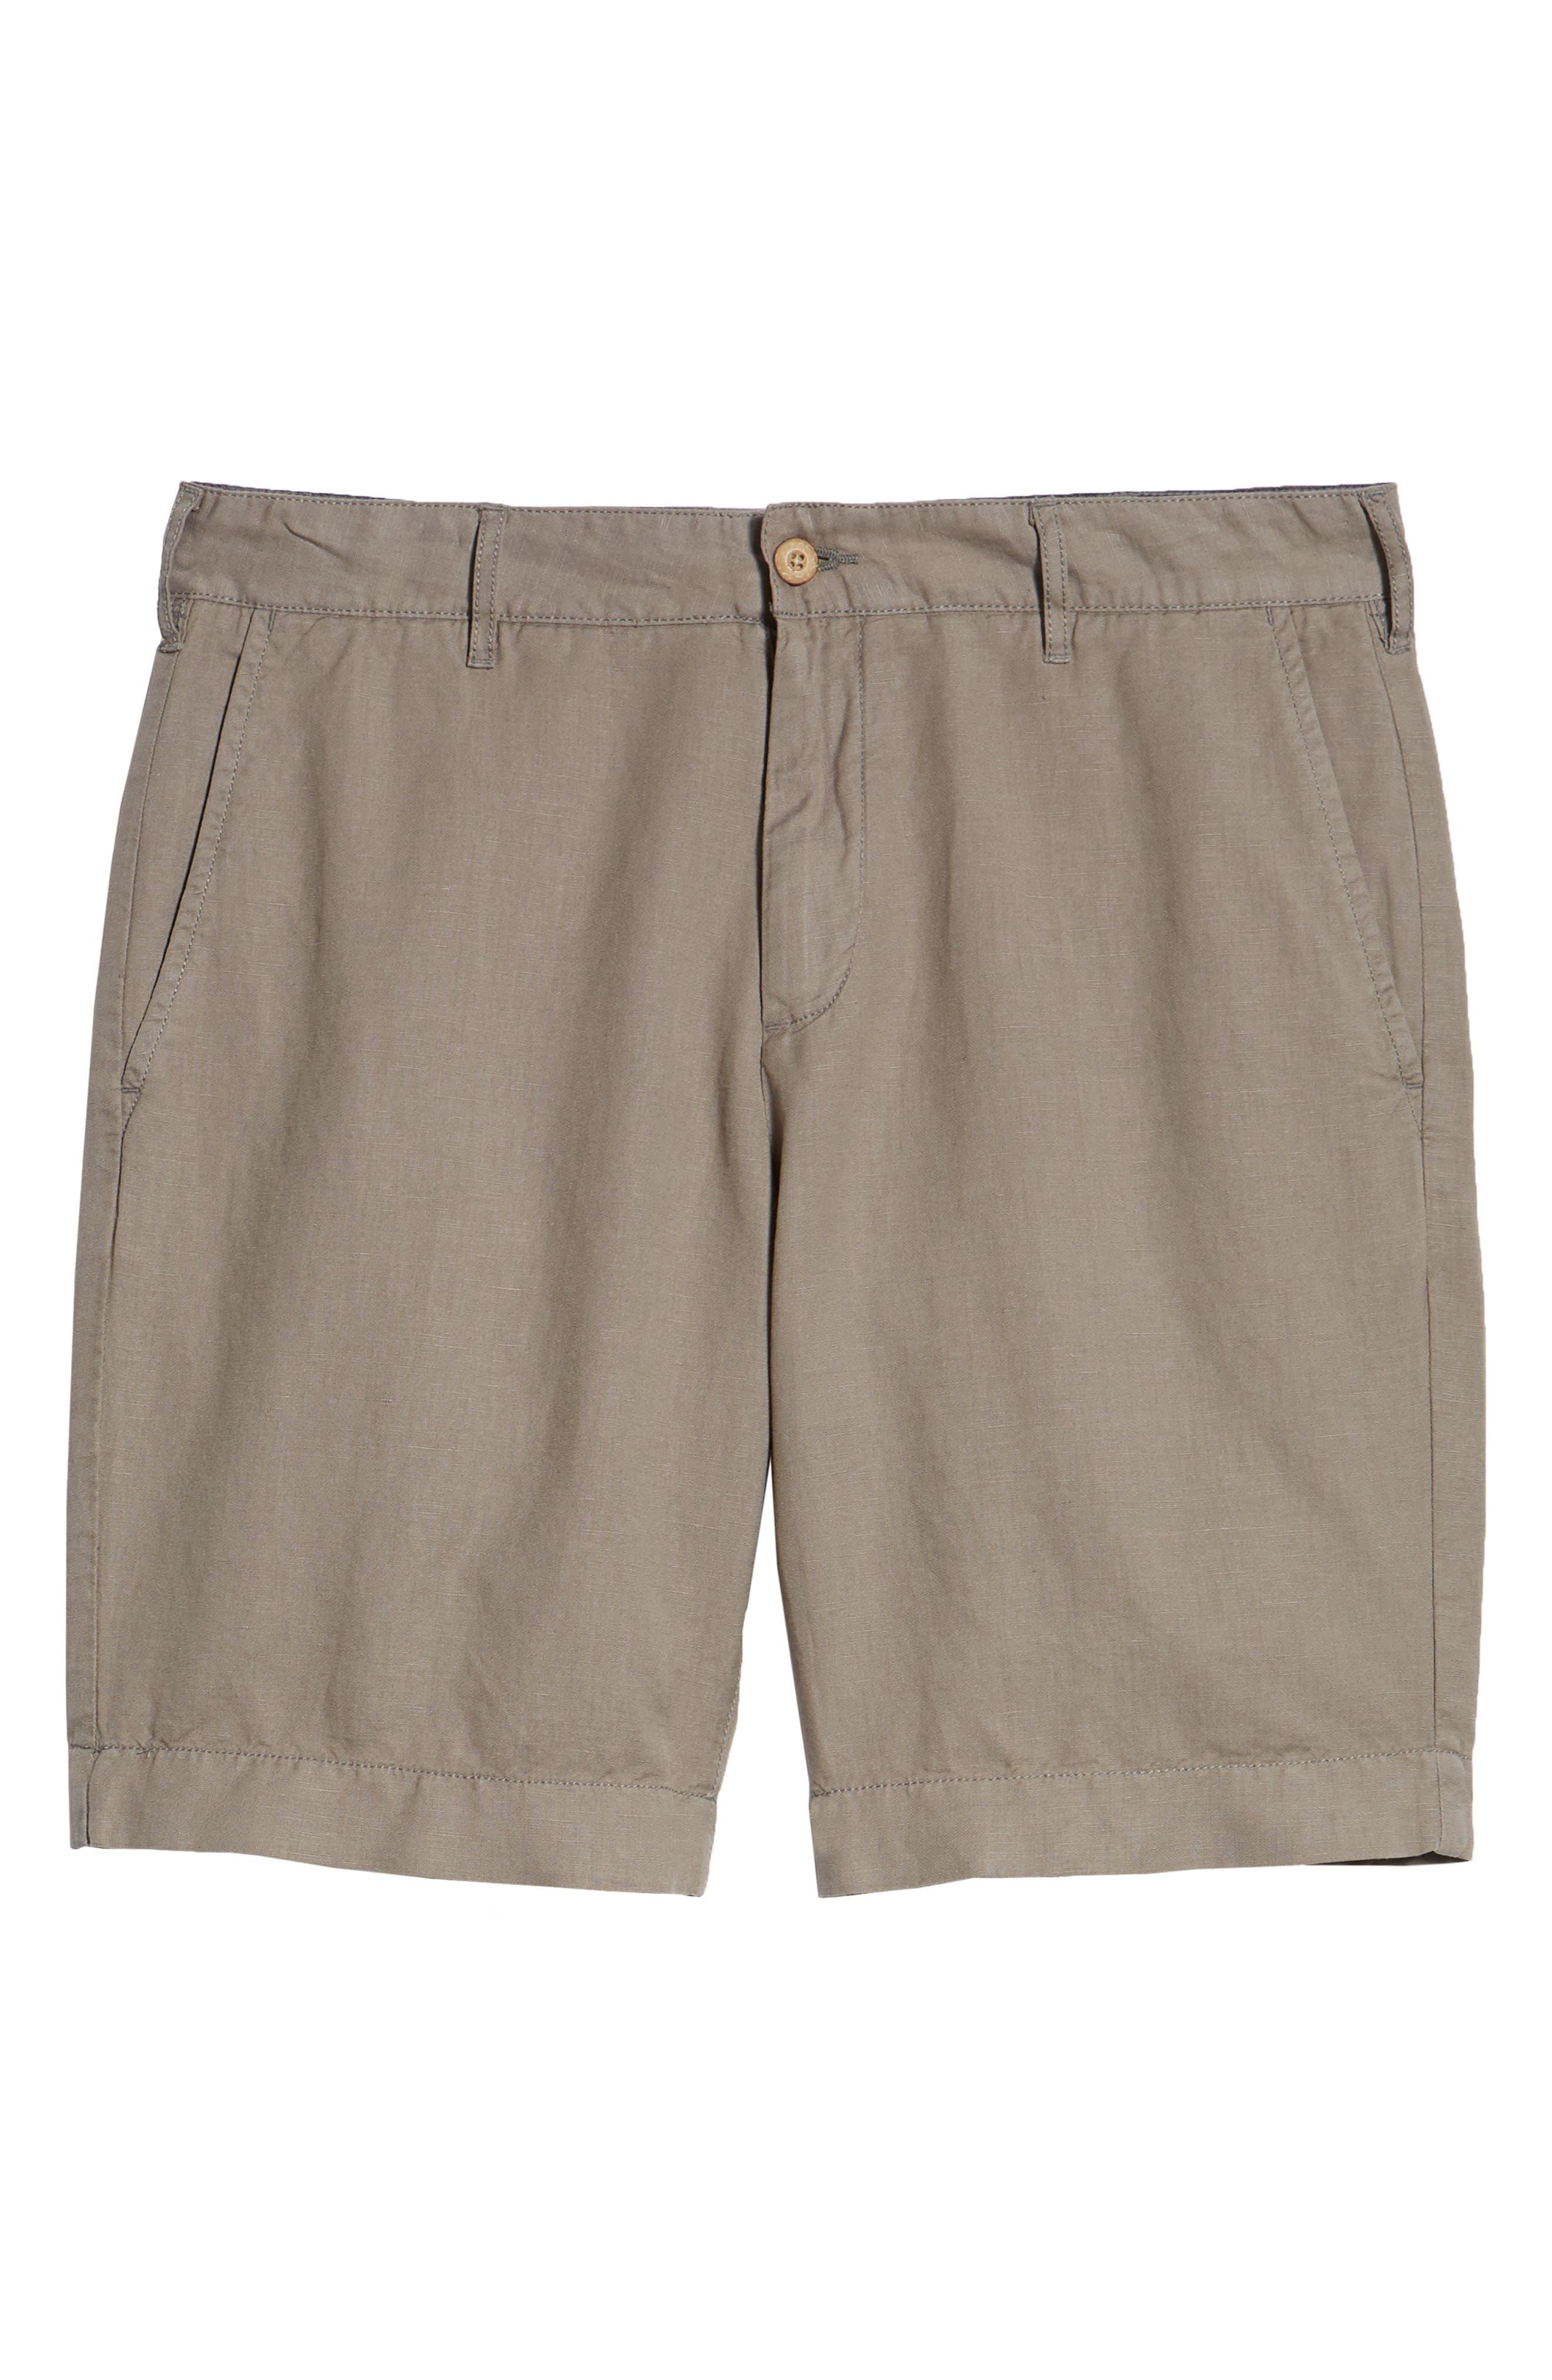 Malibu Shorts,                             Alternate thumbnail 6, color,                             GREY